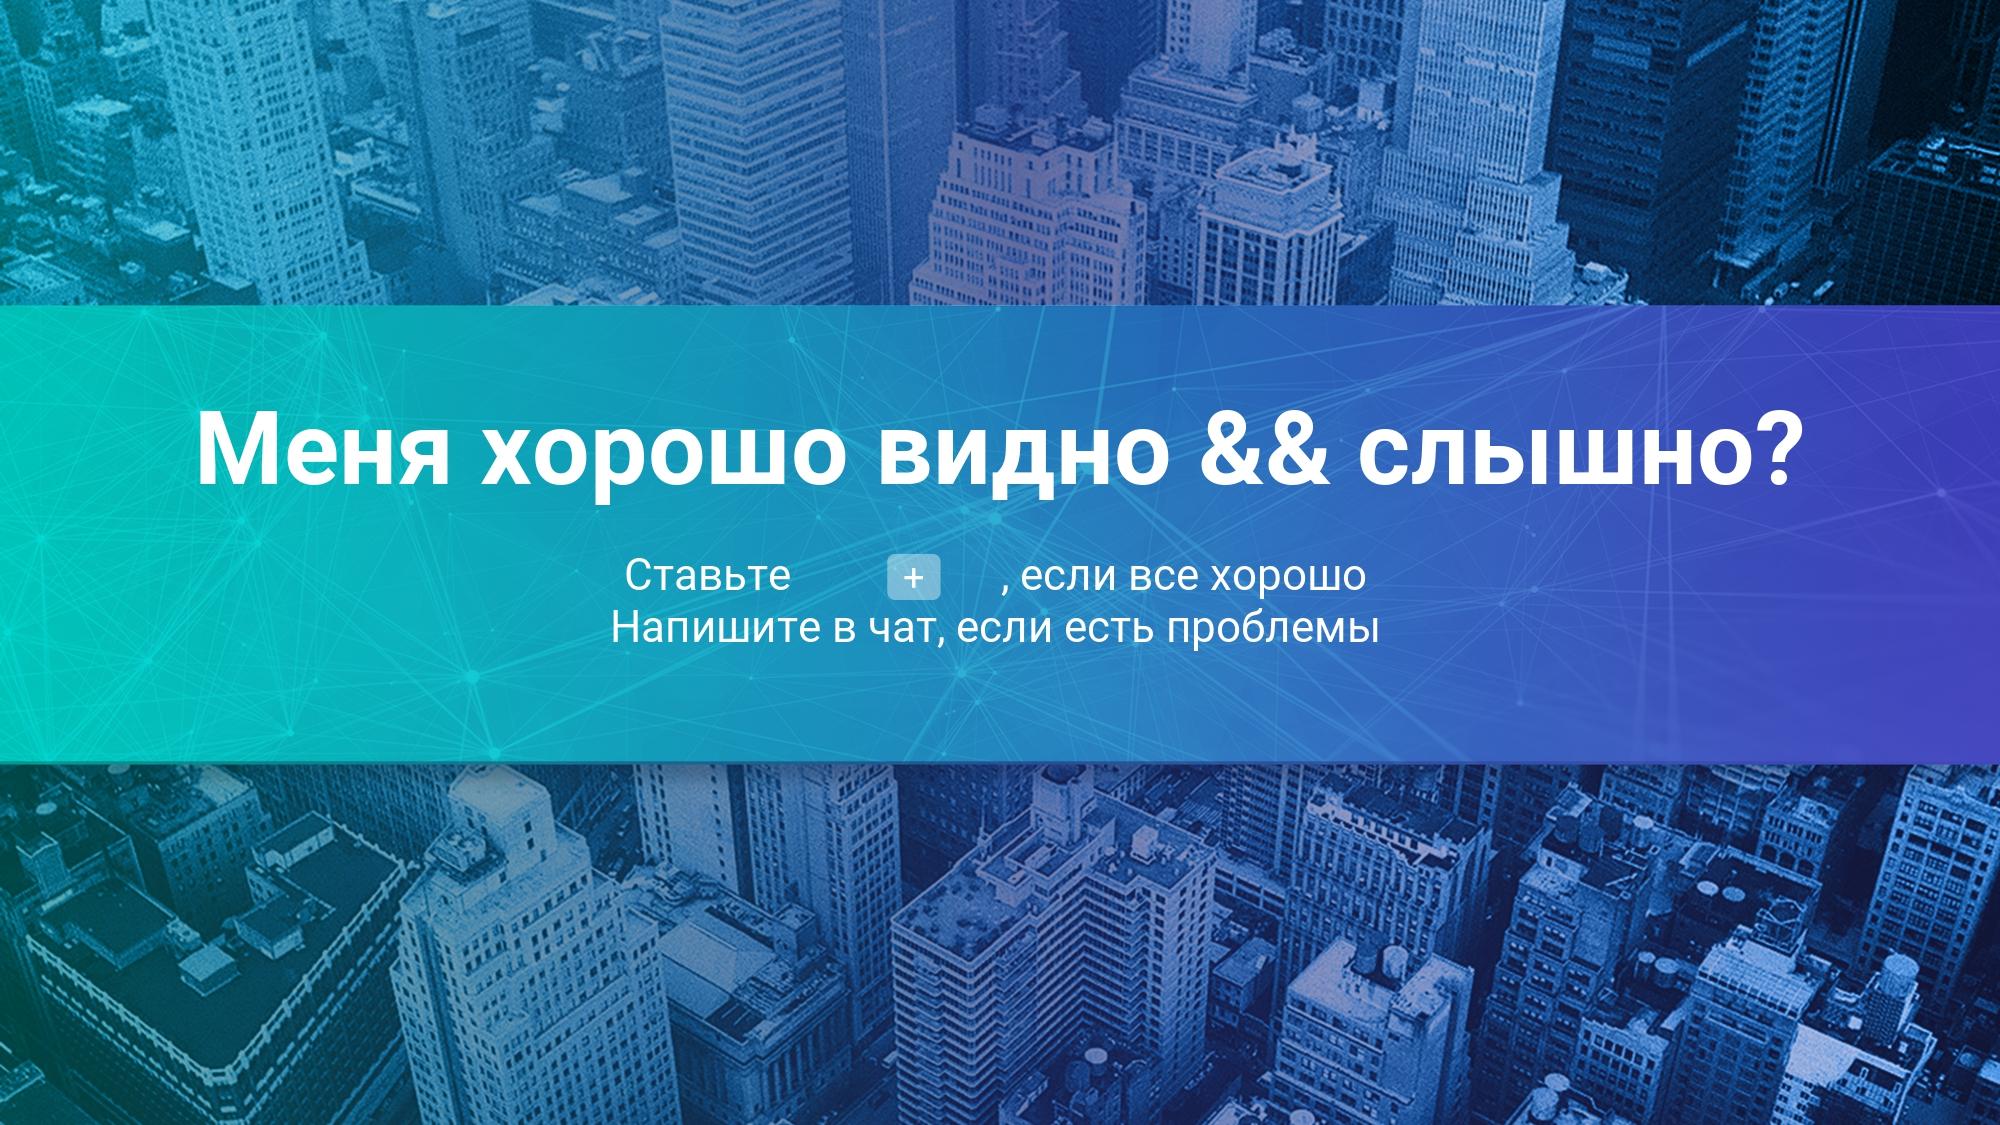 Шаблон_презентации_вебинара_в_новом_дизайне_с_подсказками_page_0002-73510-5386cf.jpg